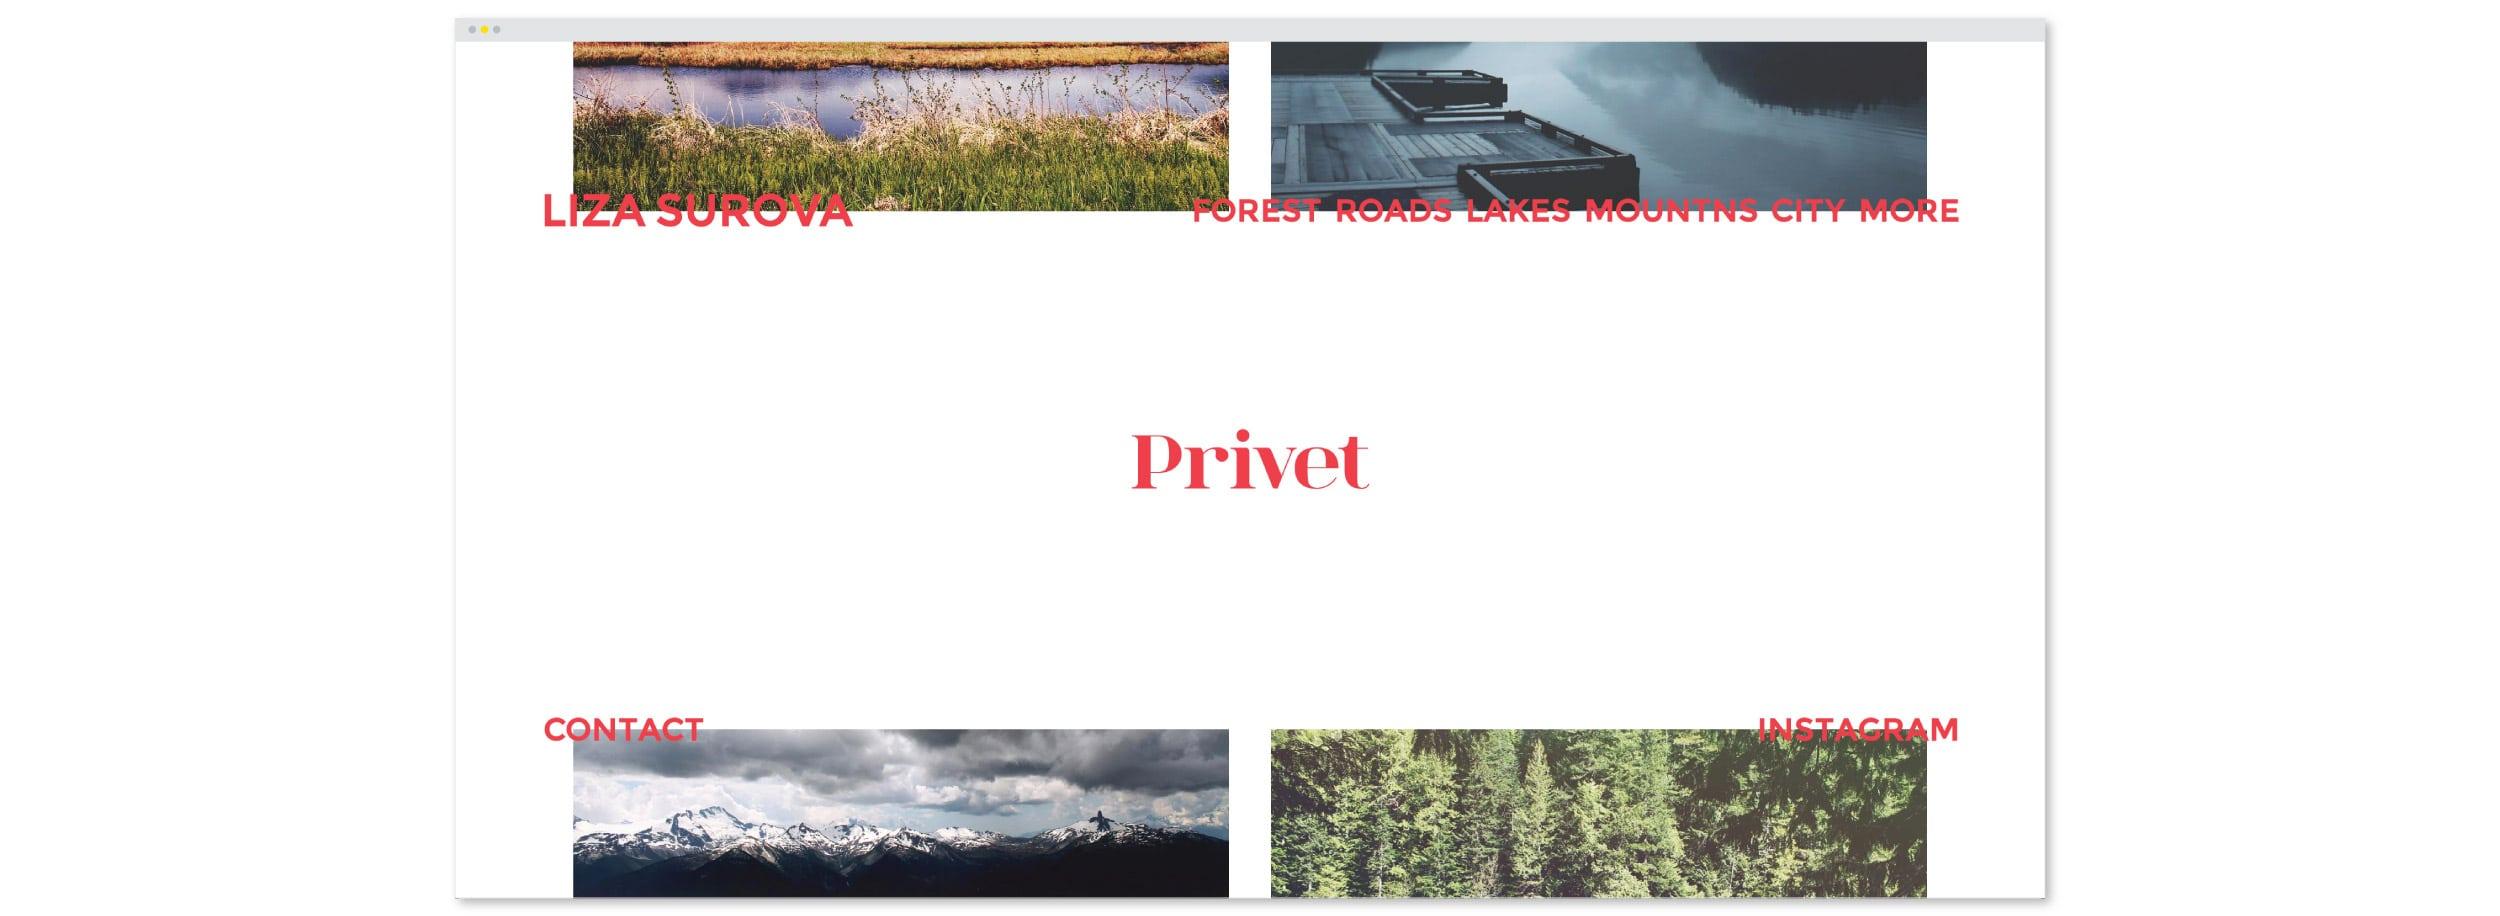 Liza Surova's Website: Homepage Design